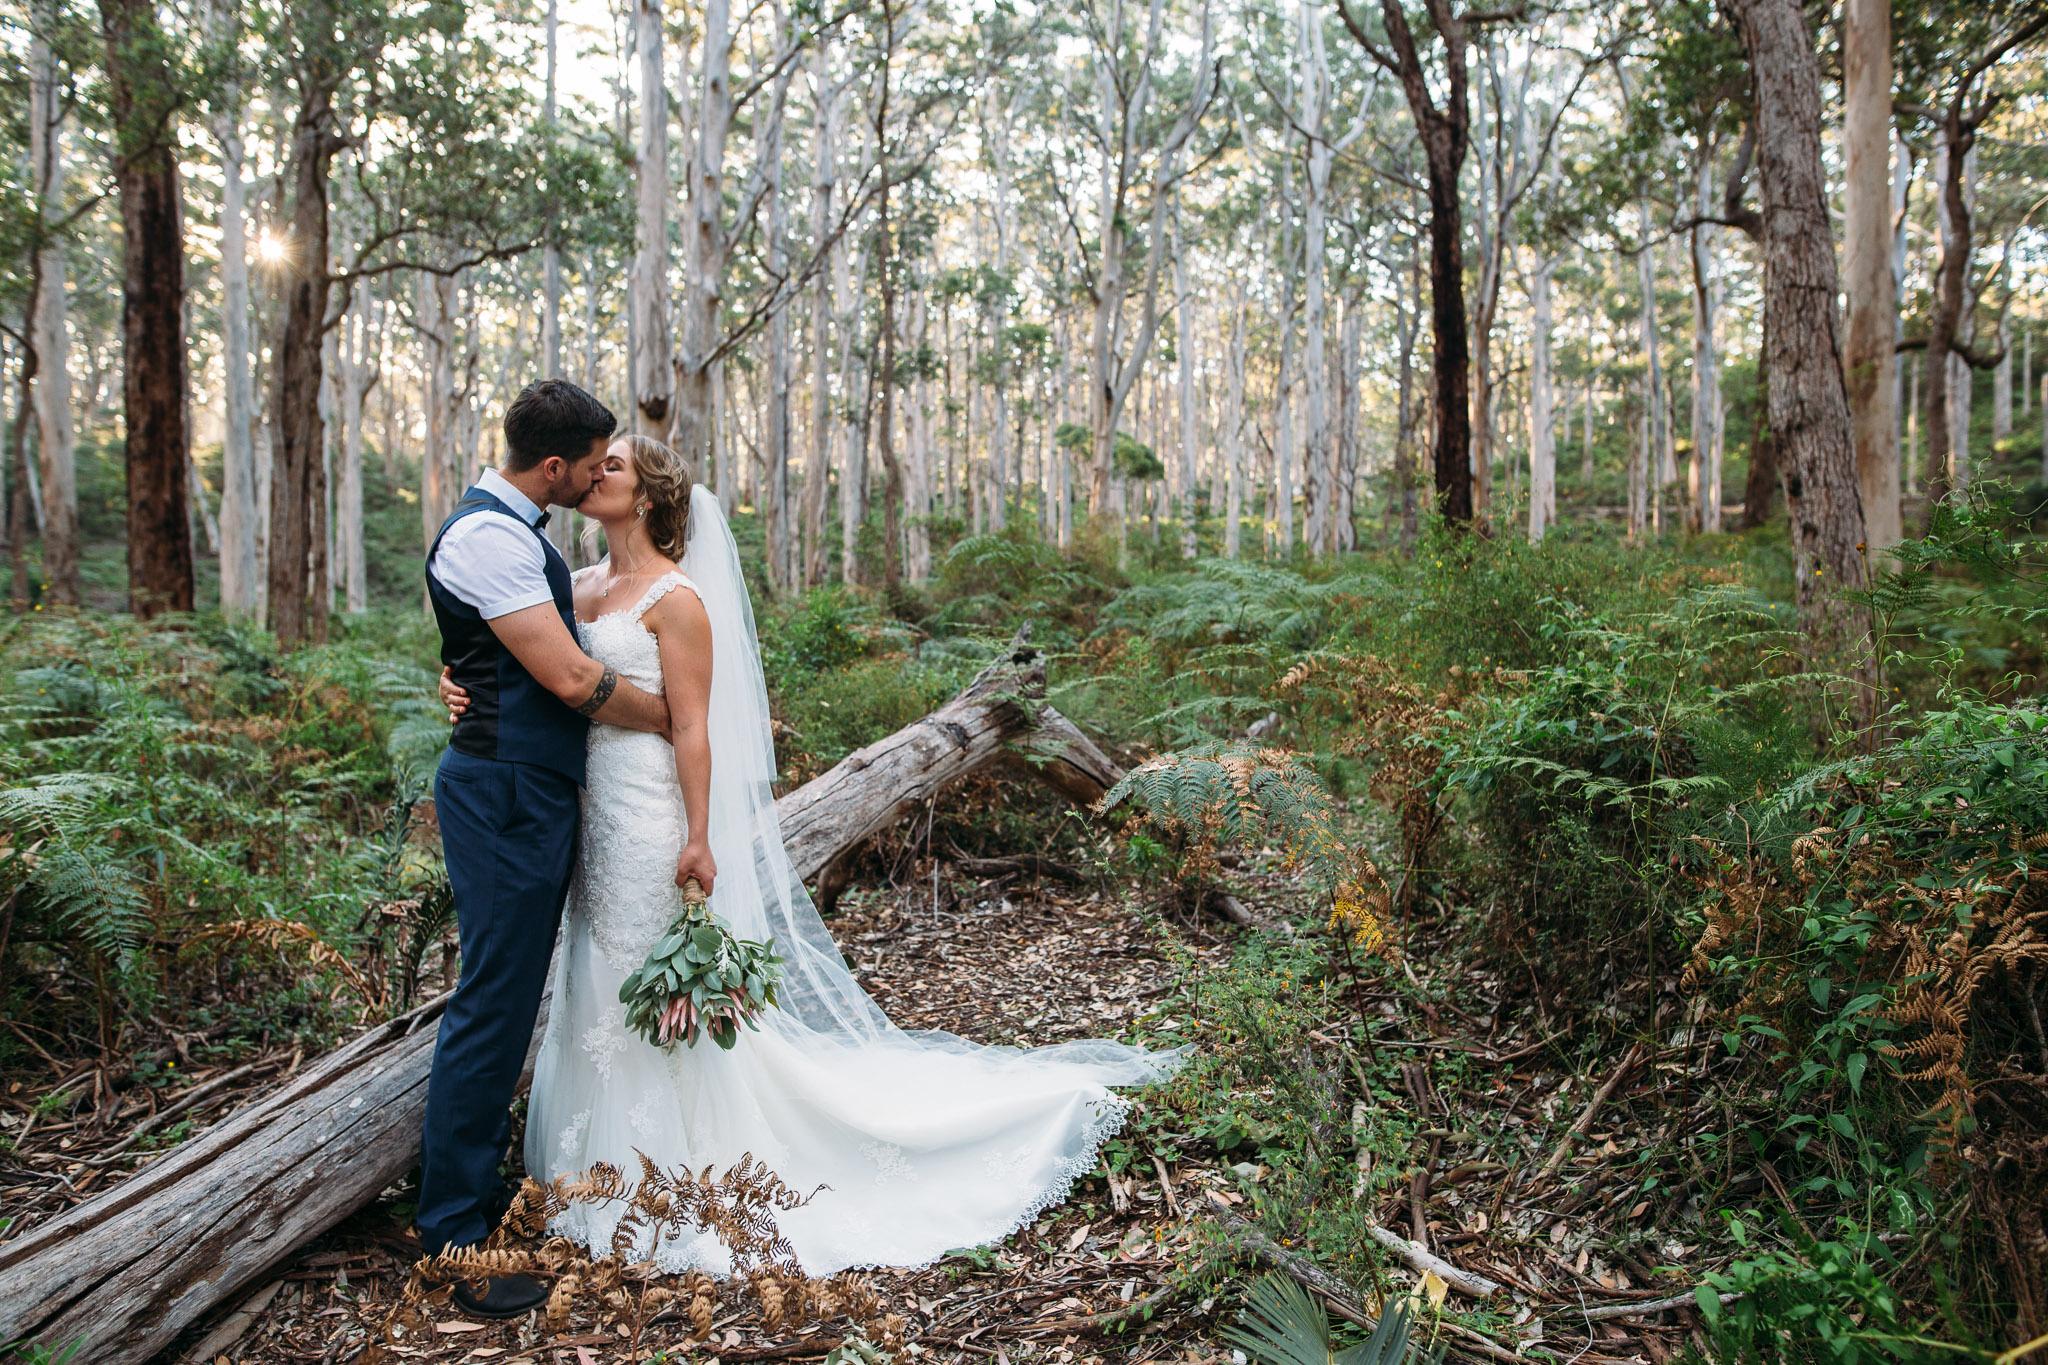 Boron Forest-Margaret River wedding